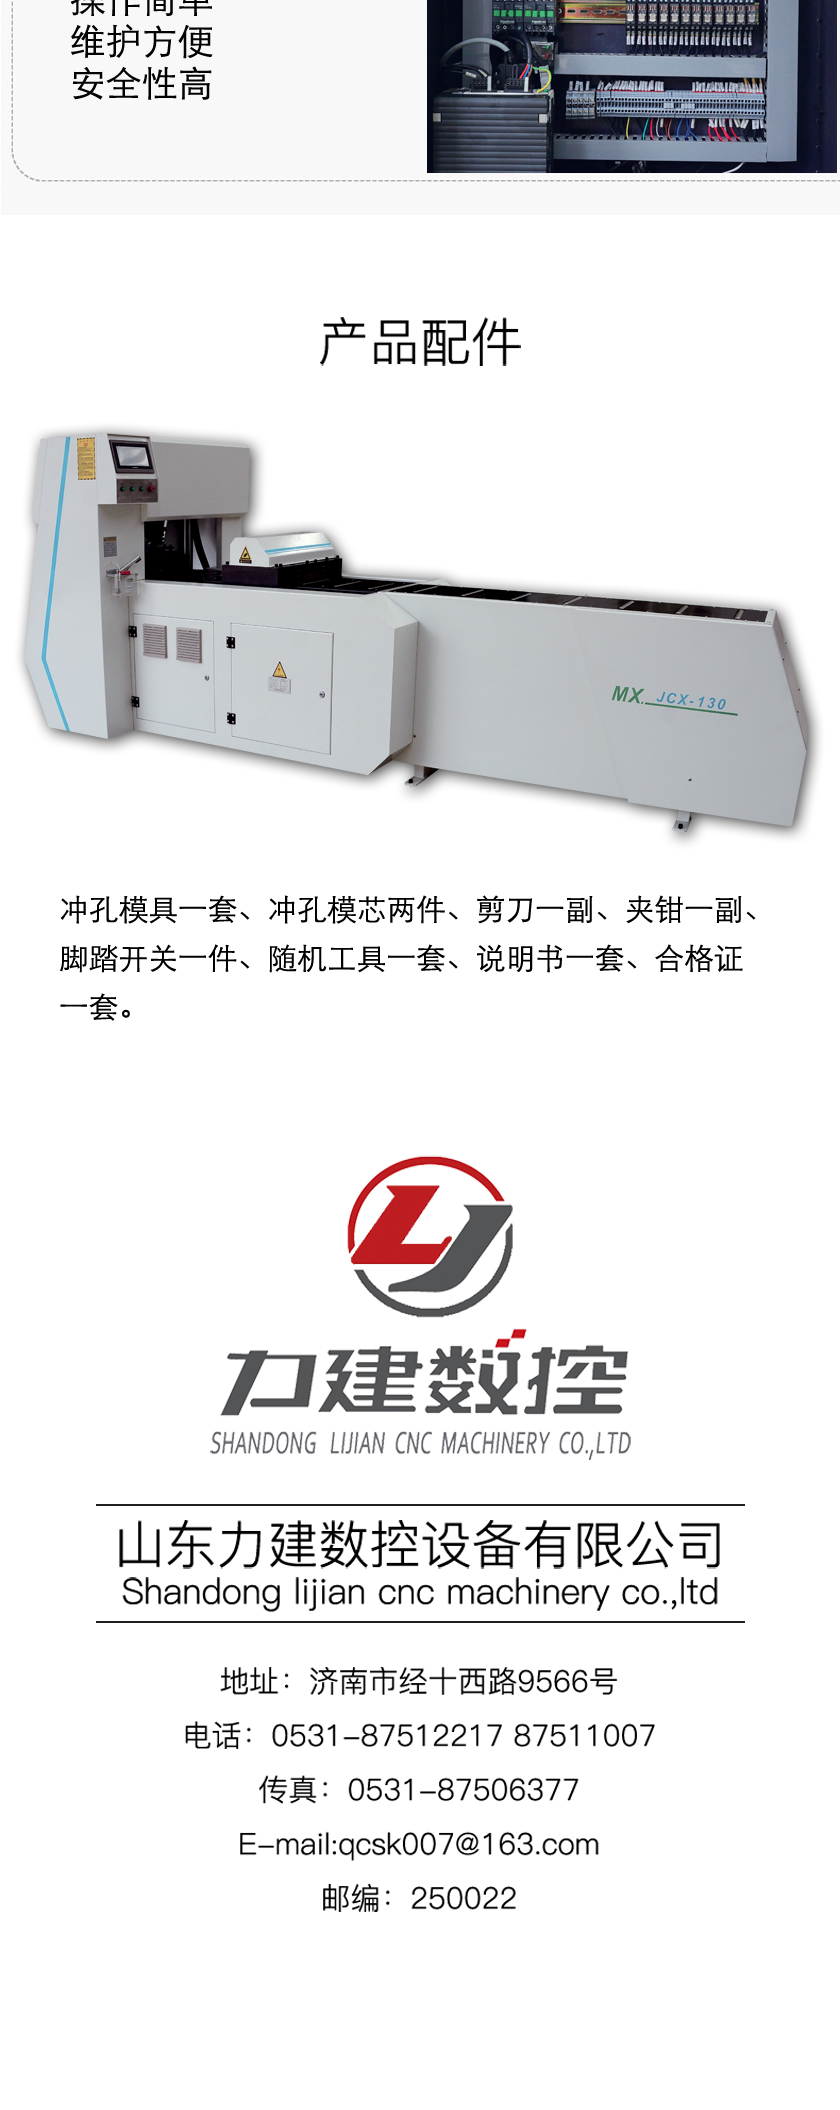 MX.JCX-130數控連接排生產線